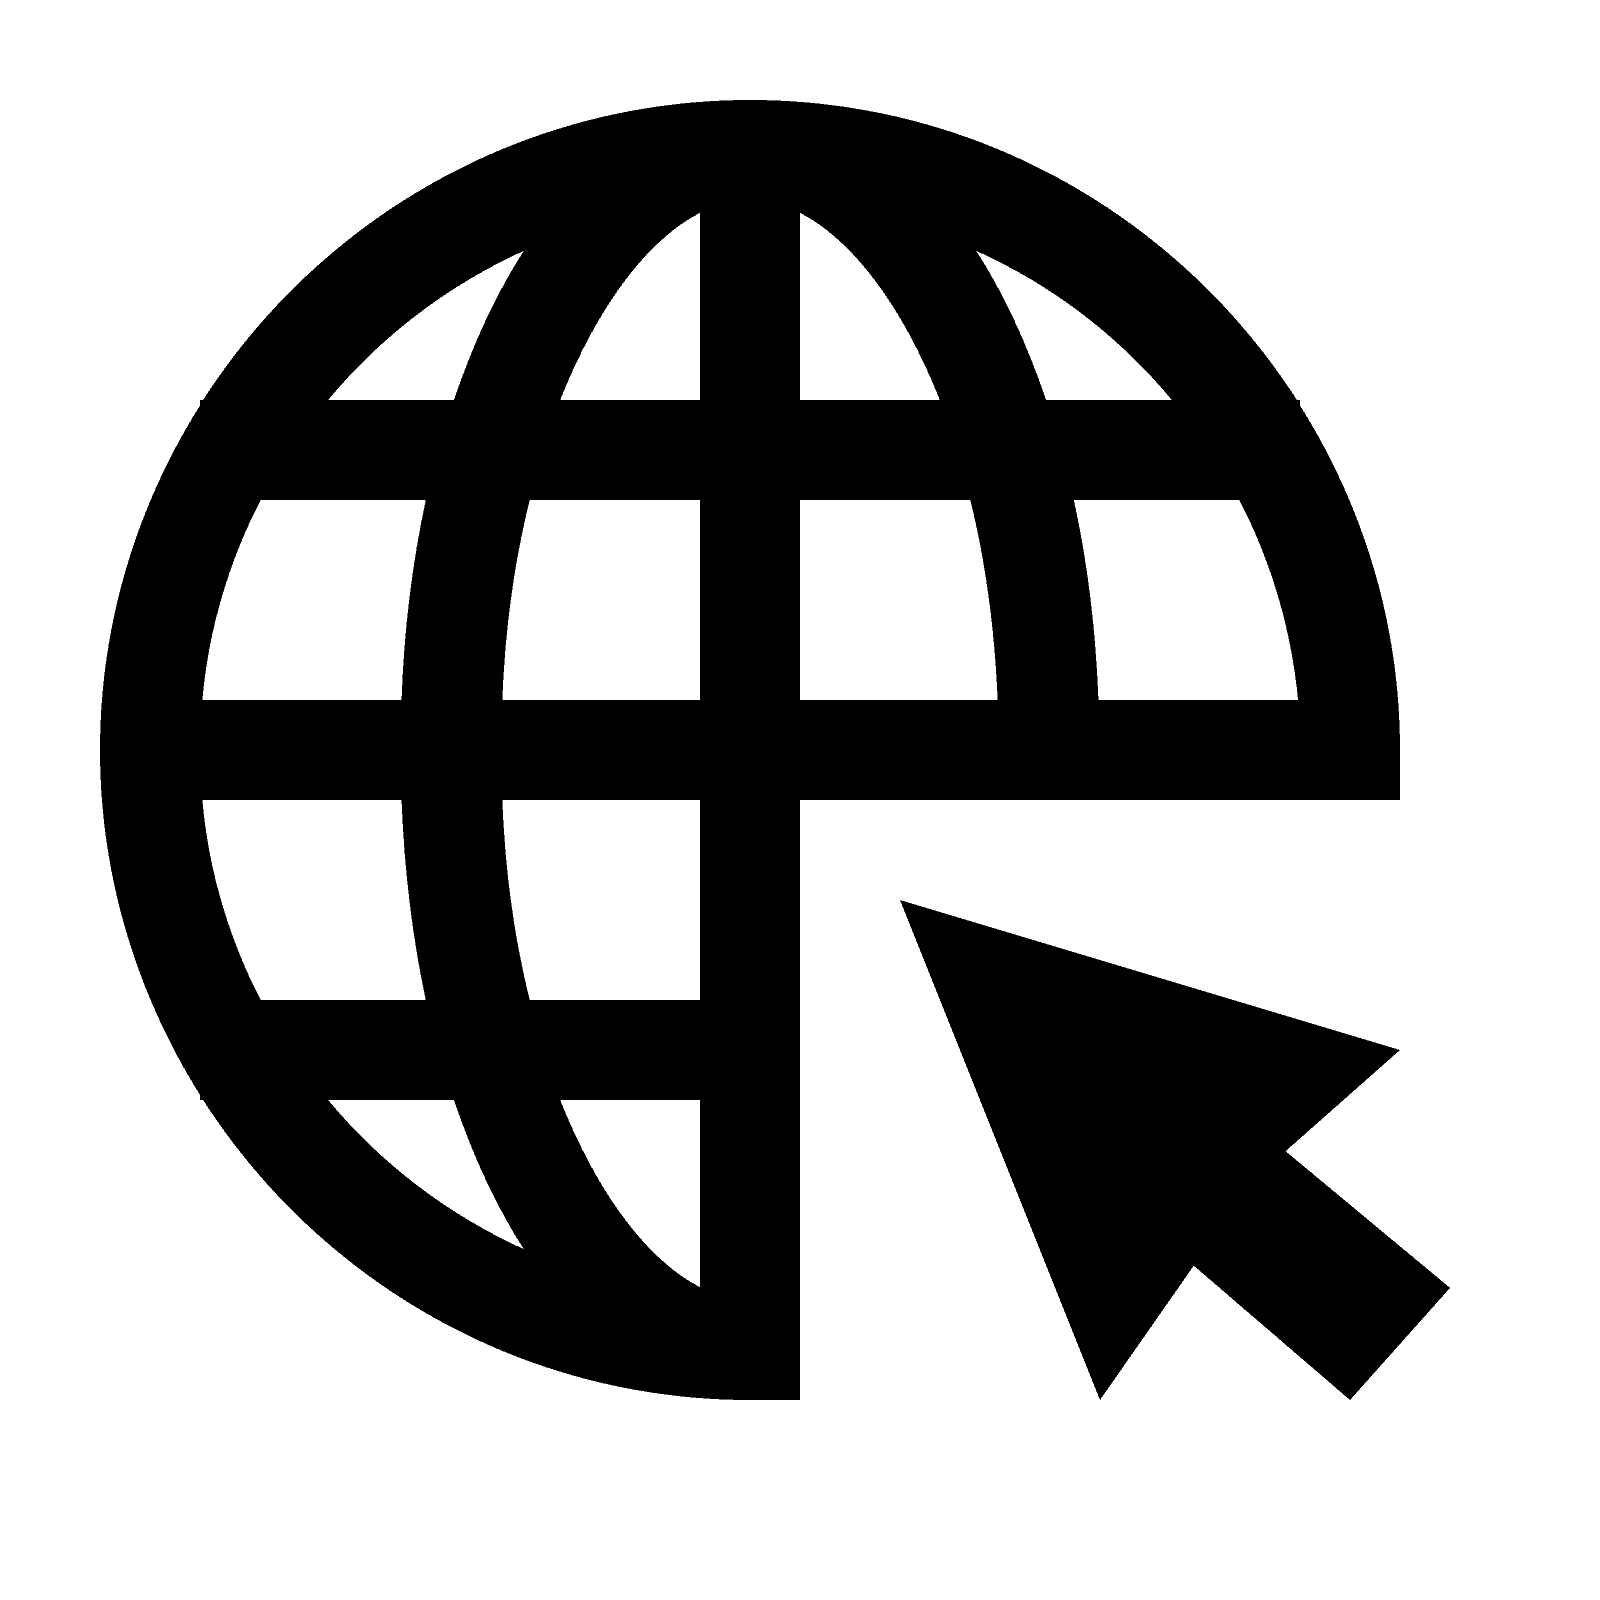 Logo Internet Explorer PNG Images, Ie Logo Clipart Free ...